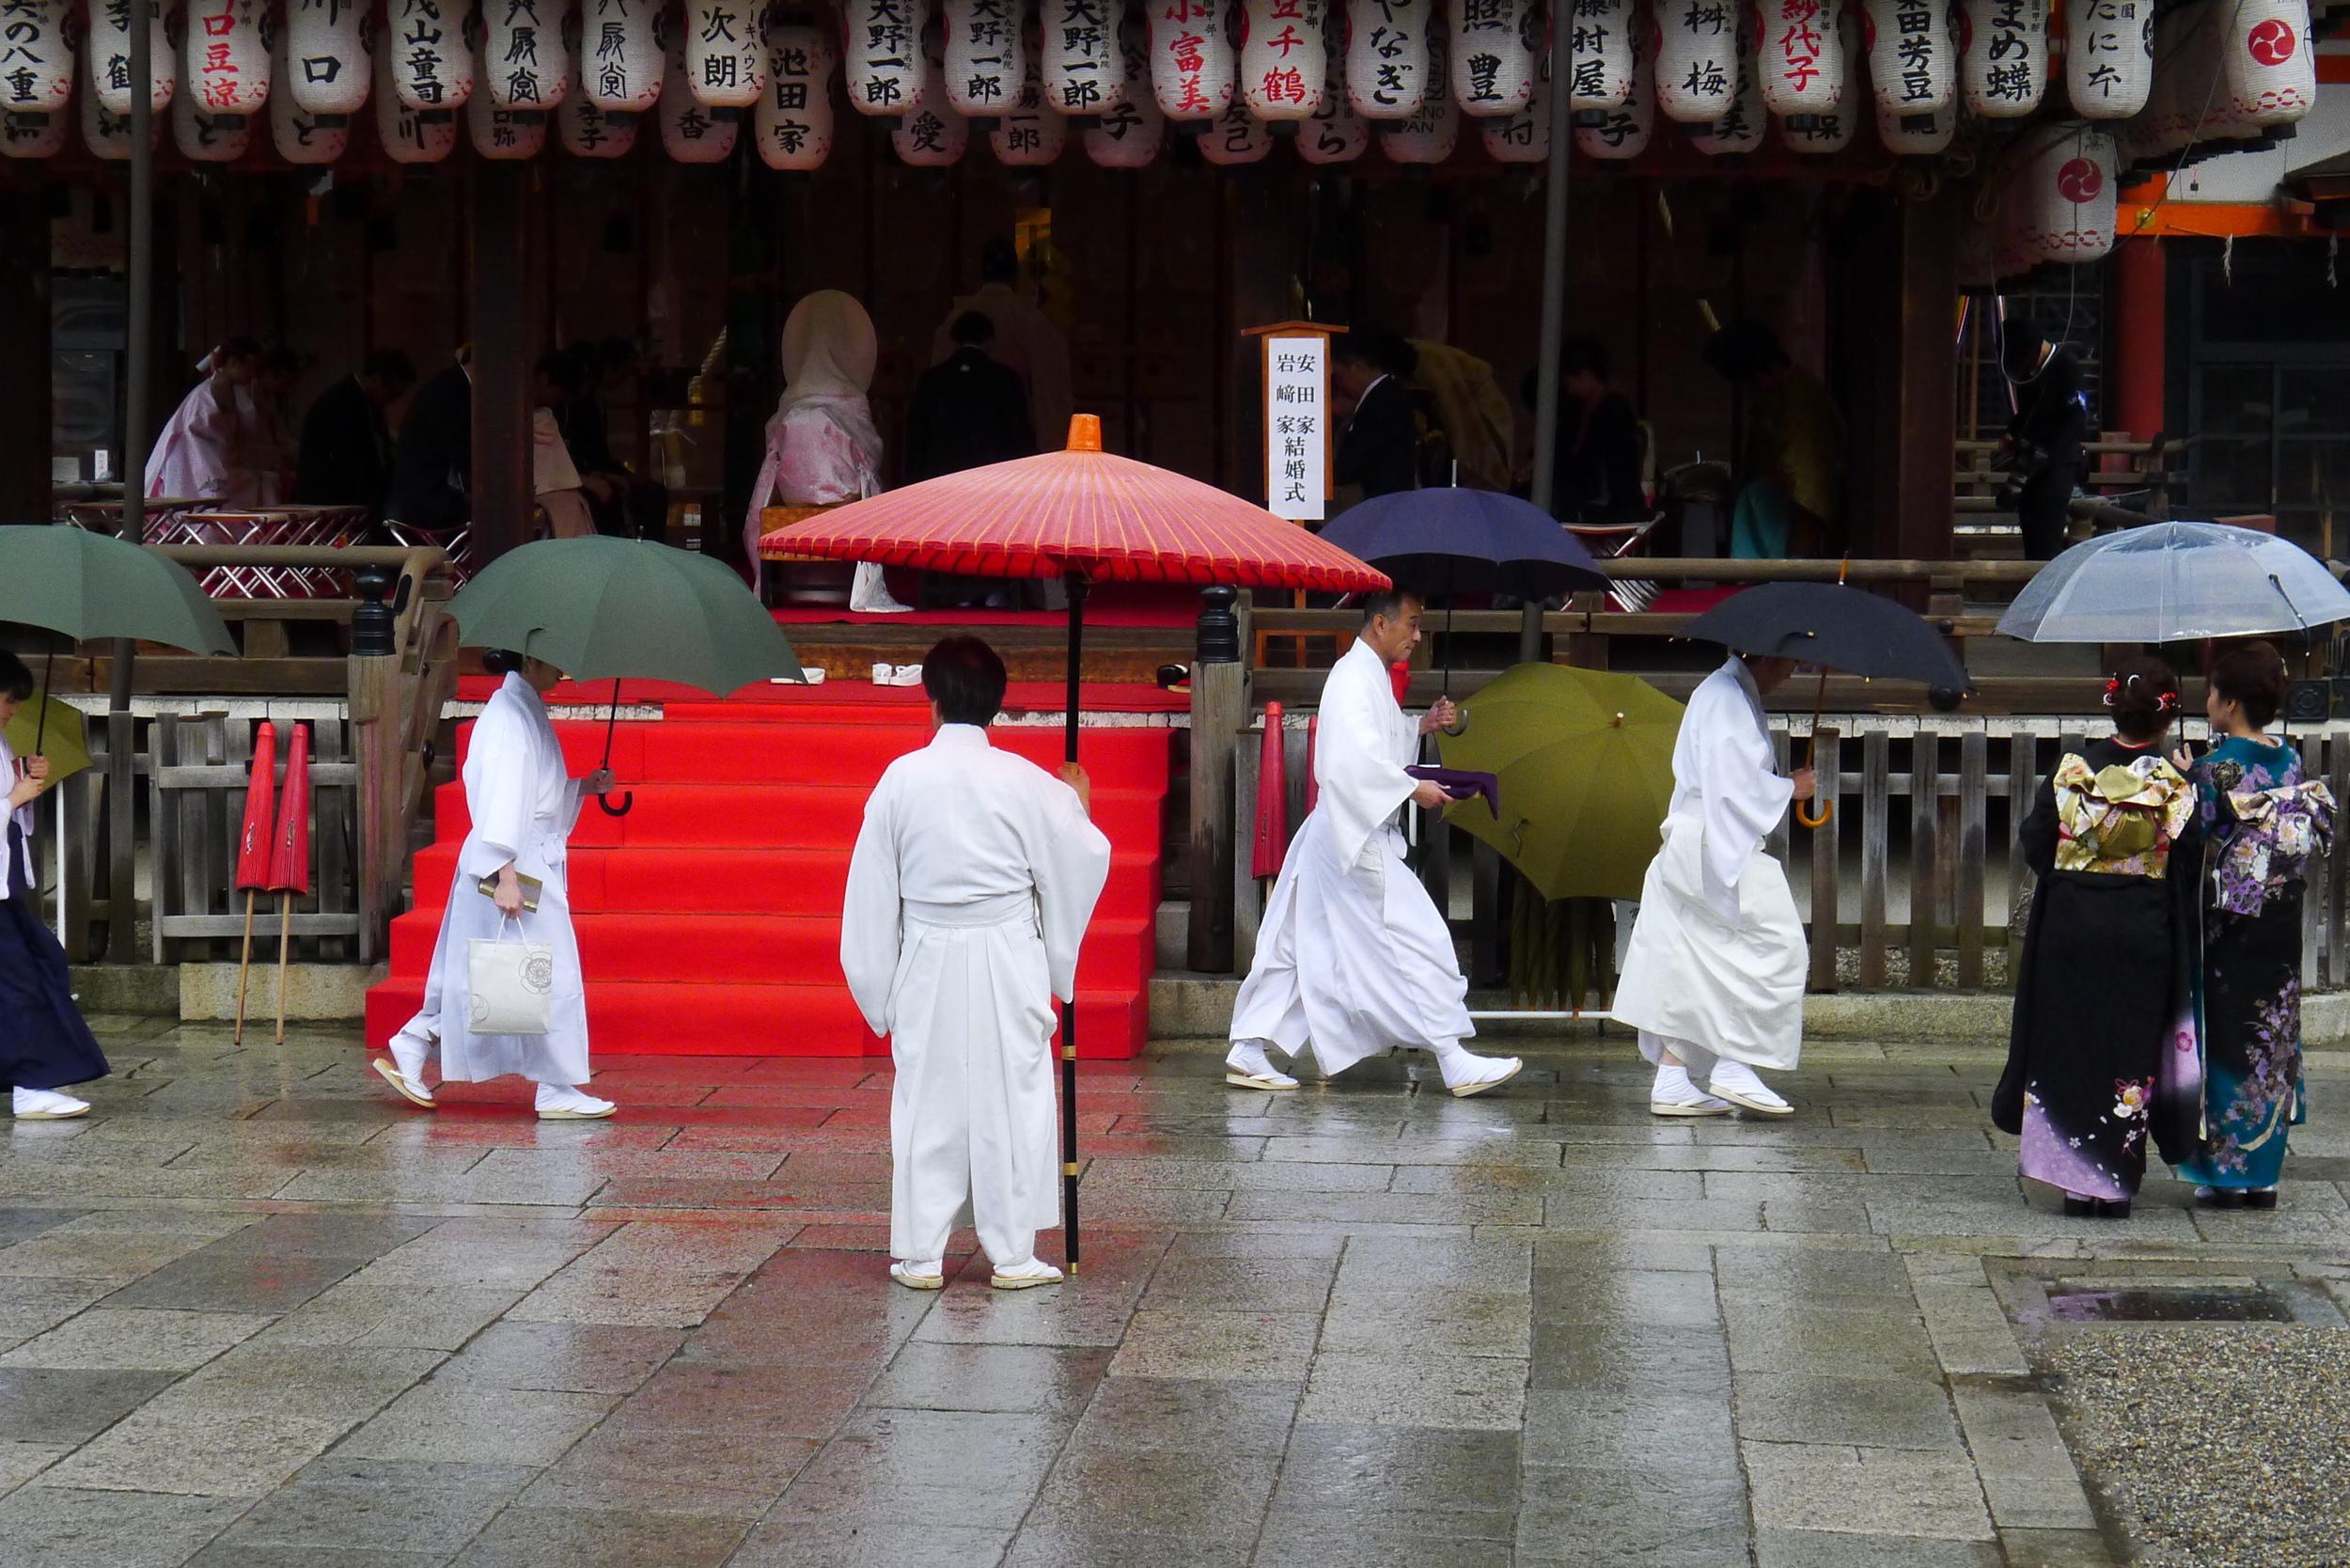 Wedding in Gion, February 14, 2014